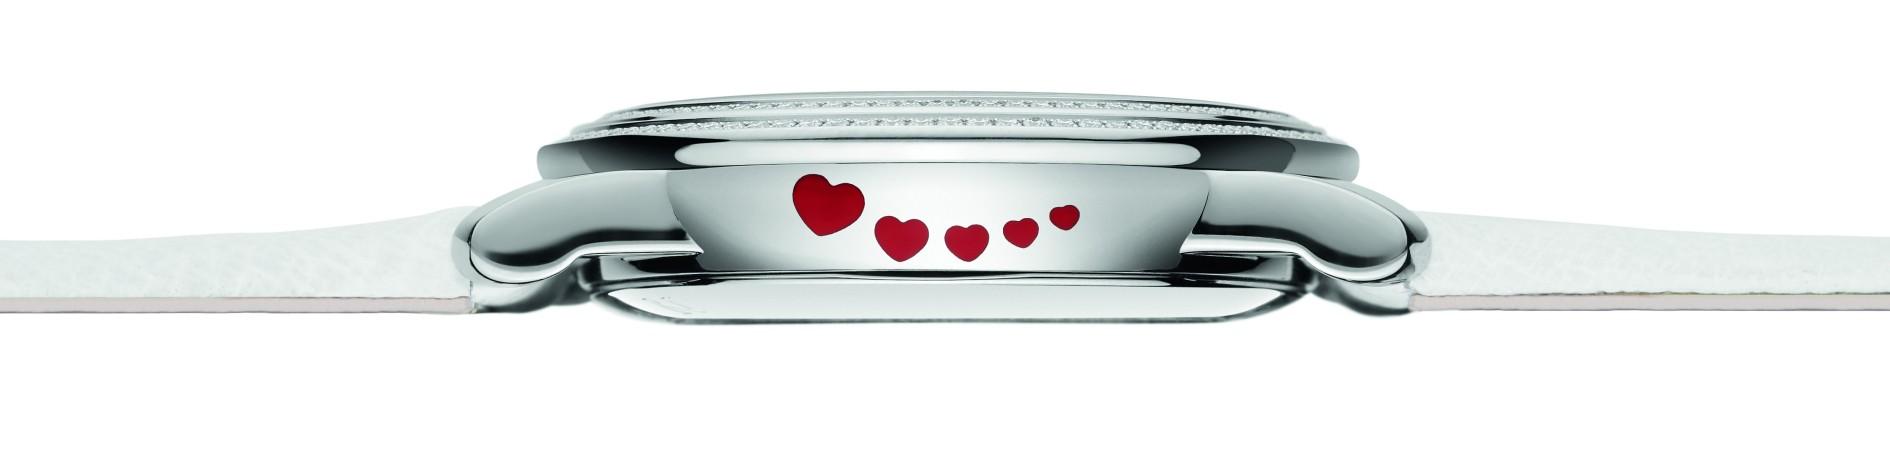 Blancpain St-Valentin 2013 profil